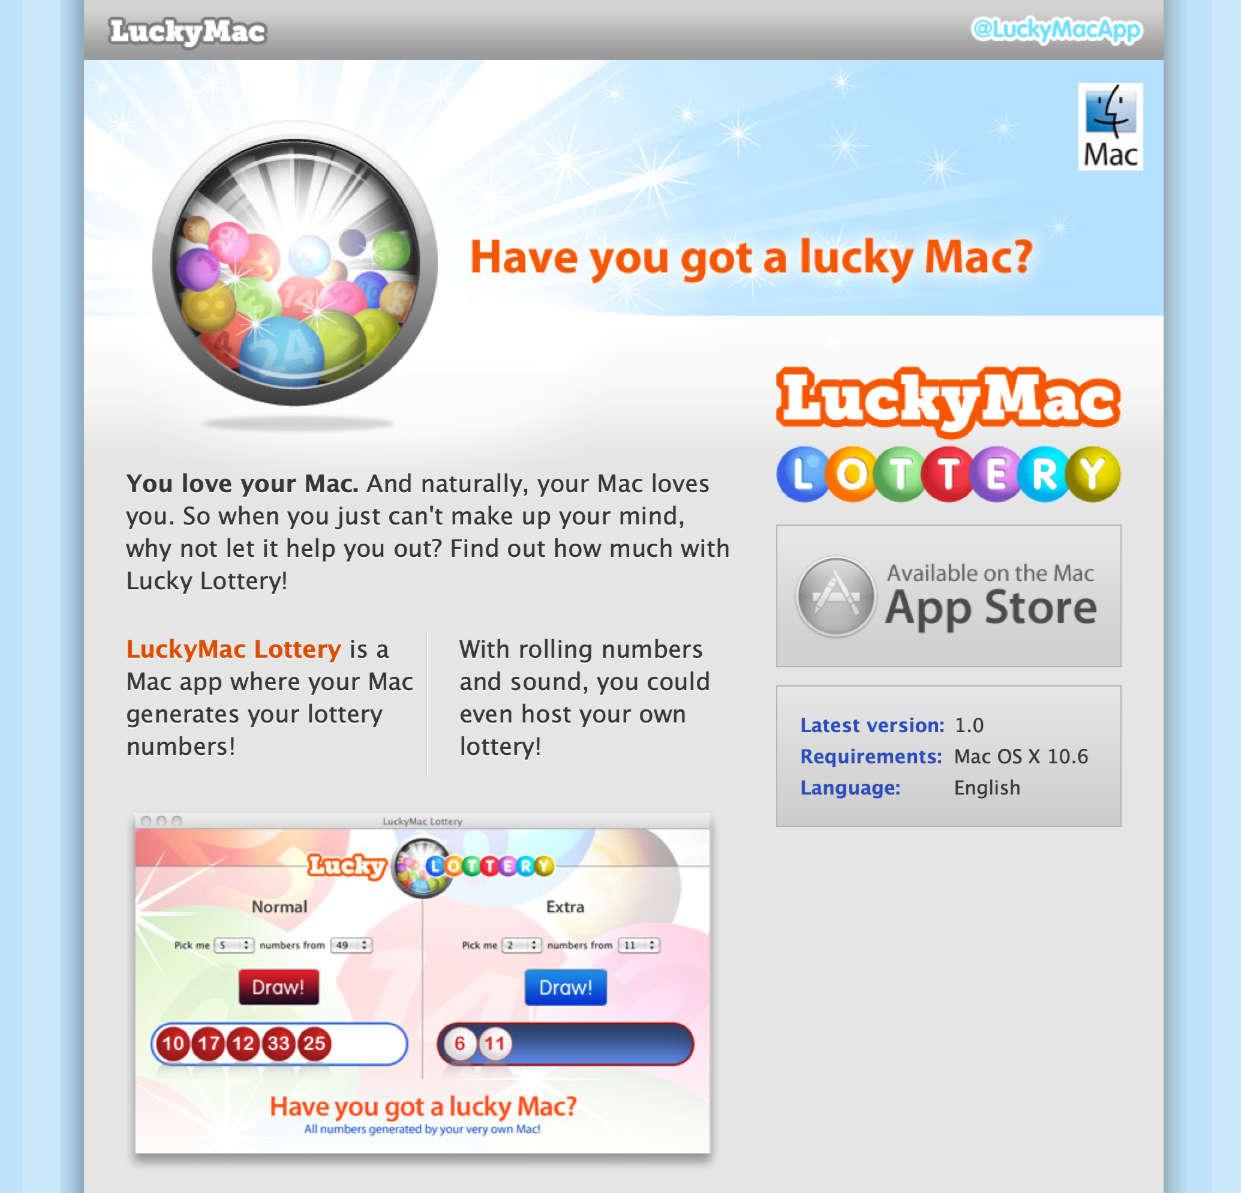 luckymac